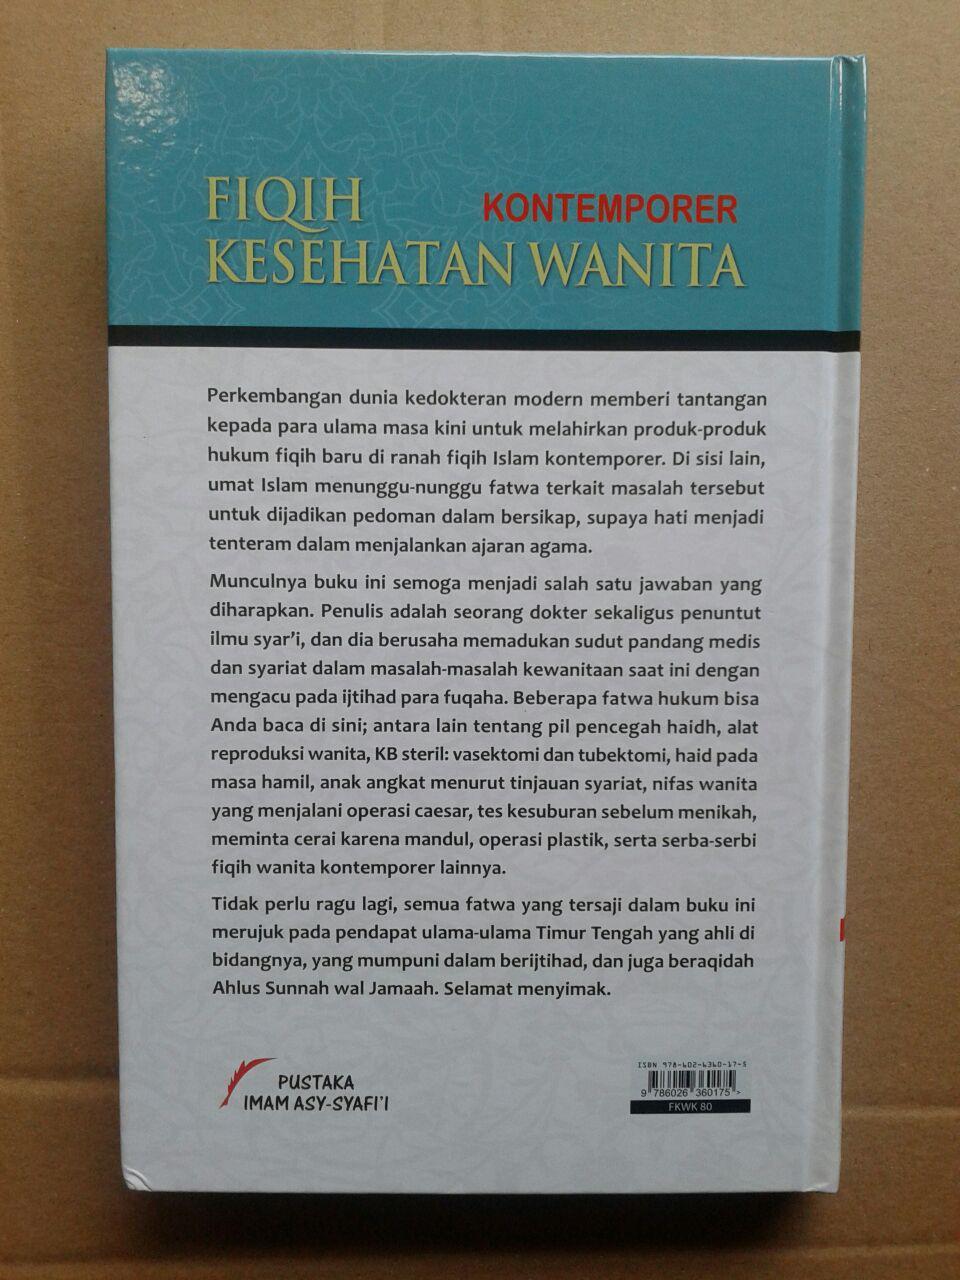 Buku Fiqih Kontemporer Kesehatan Wanita cover 2